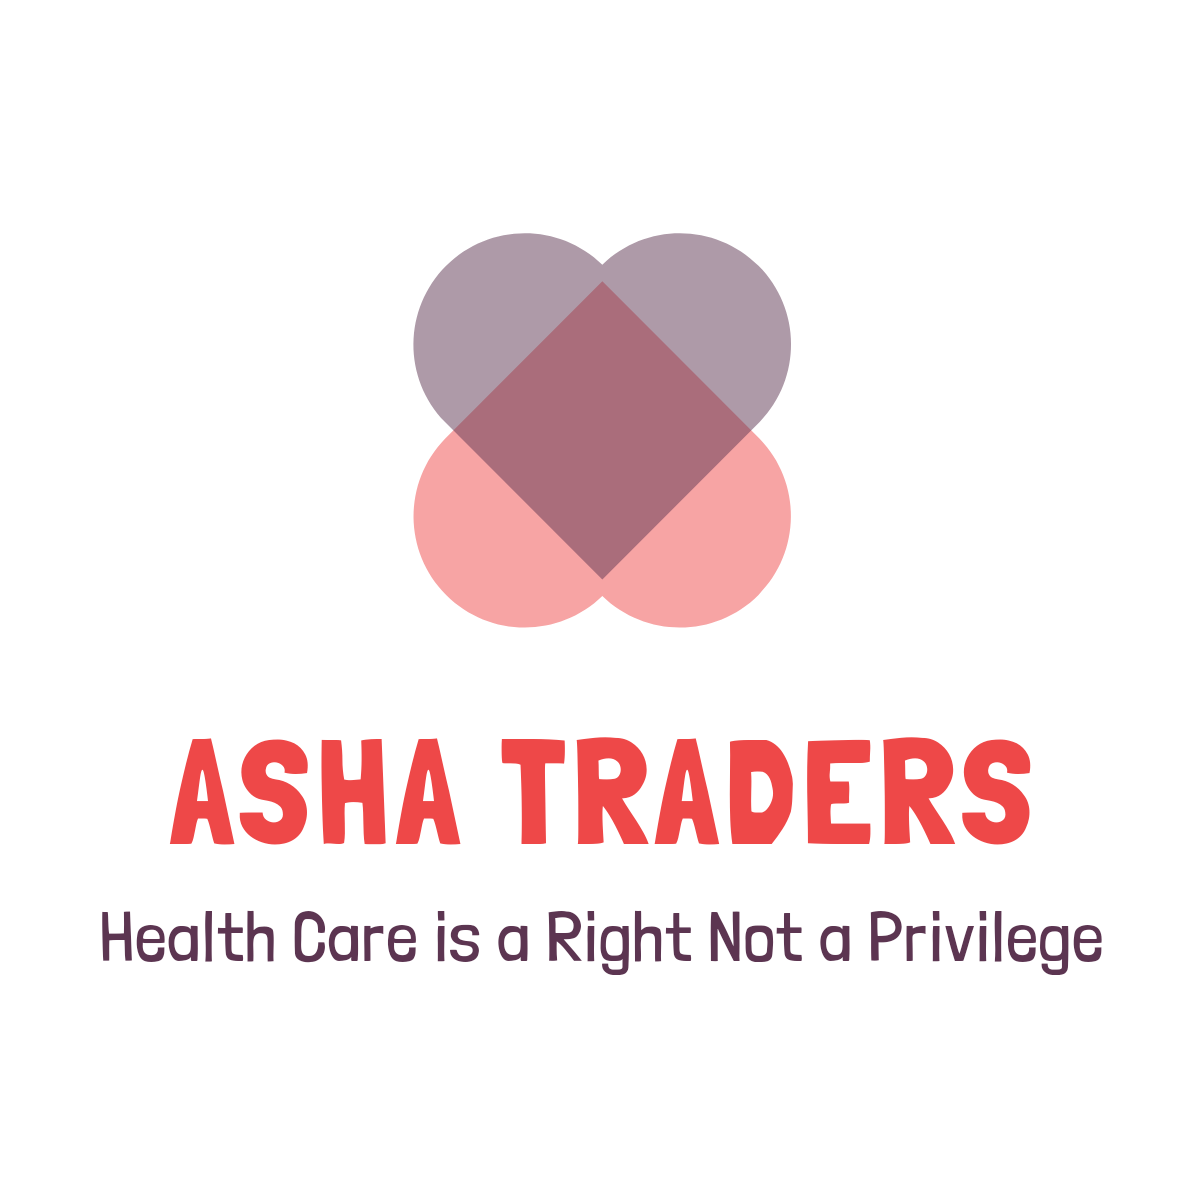 ASHA TRADERS Share Business Card